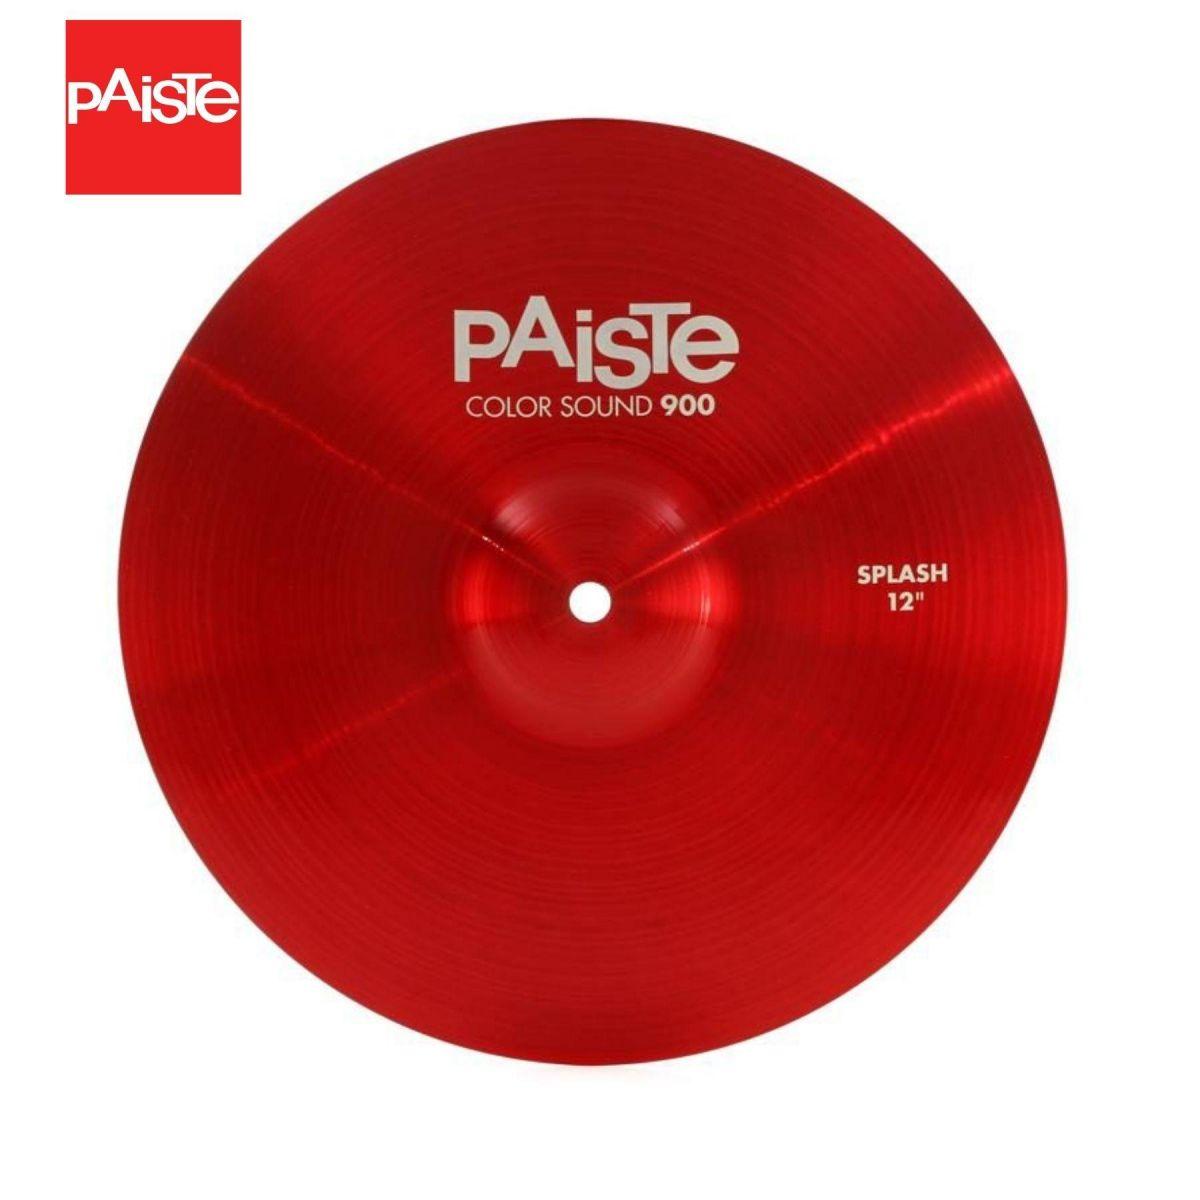 "Piatto Paiste 12"" 900 Color Sound Splash red"